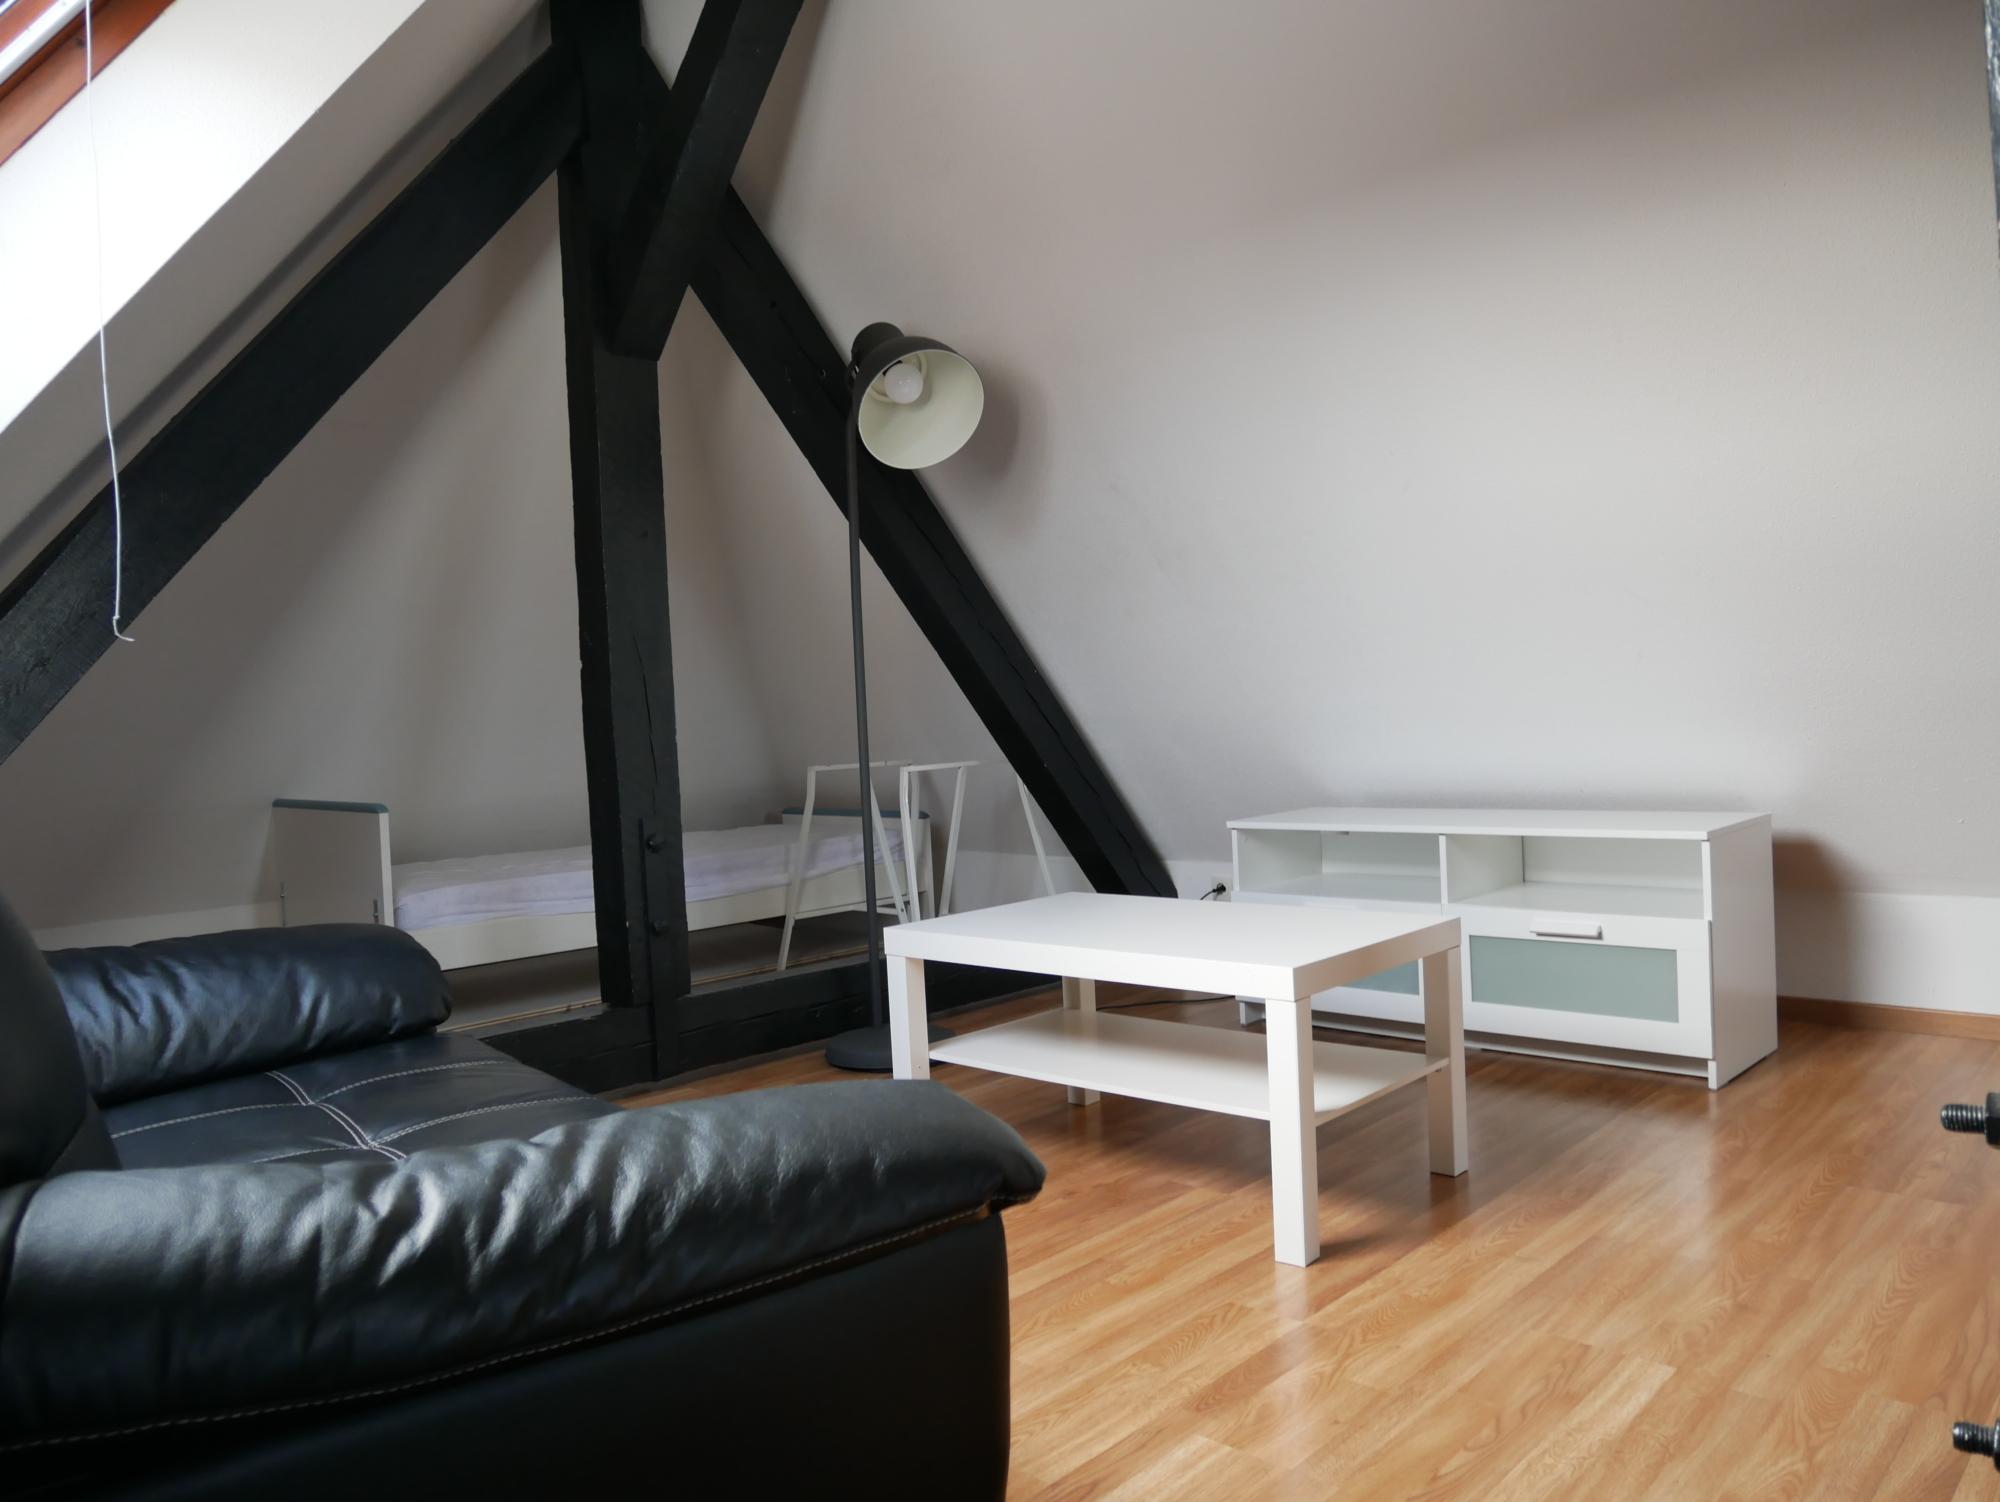 Superbe 2P meublé en duplex - Centre / Rue du 22 Novembre - nos locations - Beausite Immobilier 4